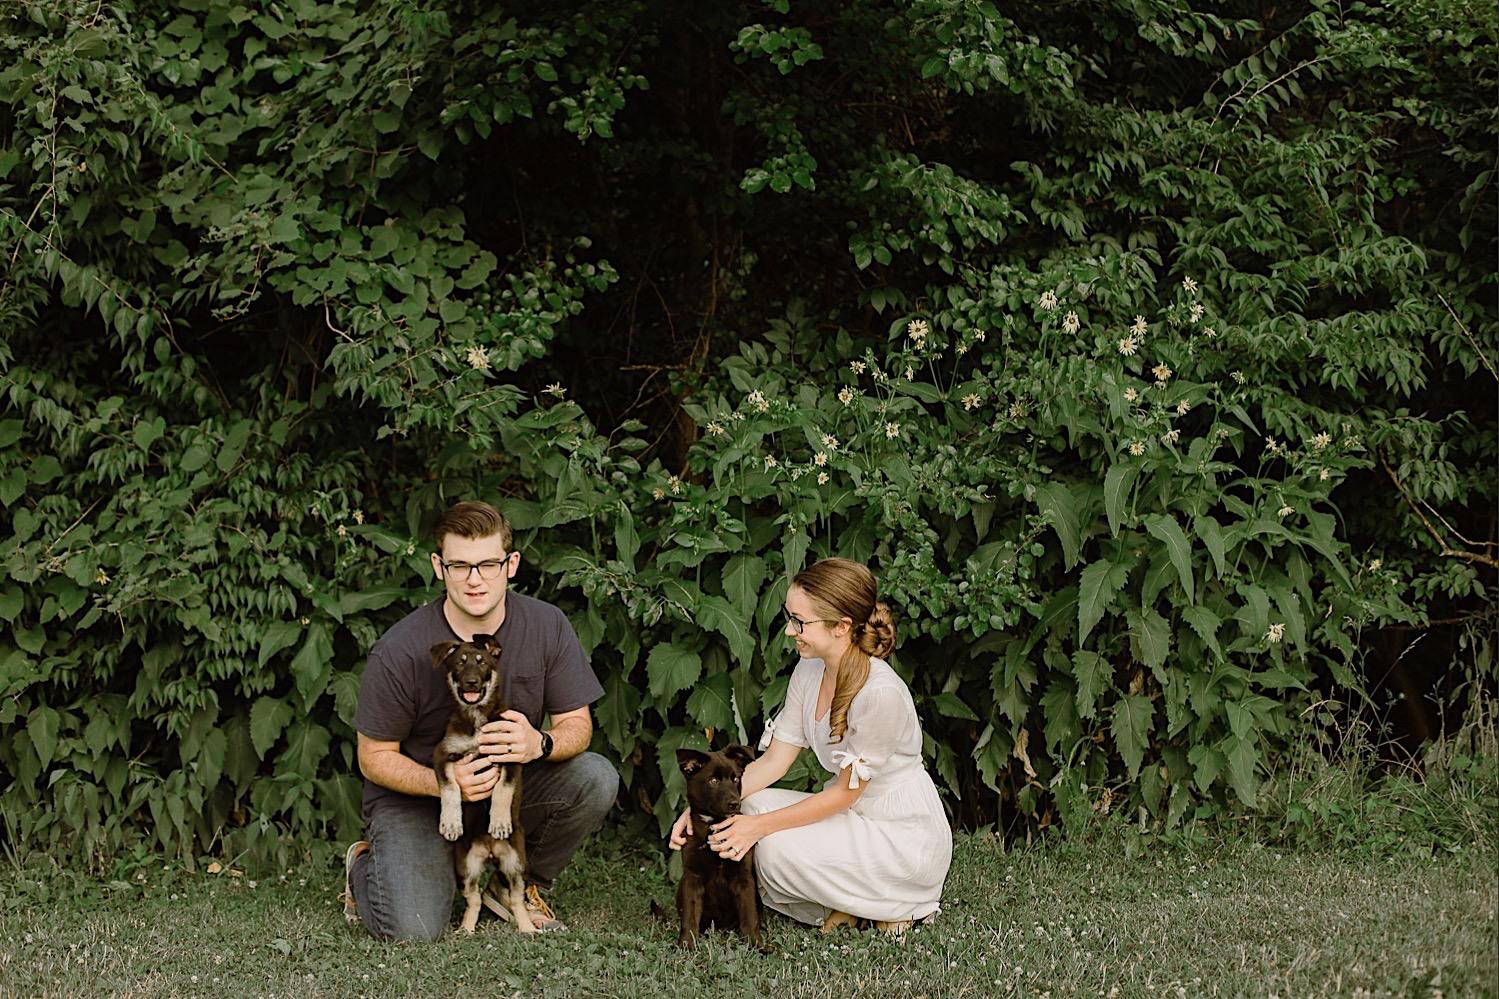 1_Pet_Photography_Photographer_dog_Indianapolis.jpg